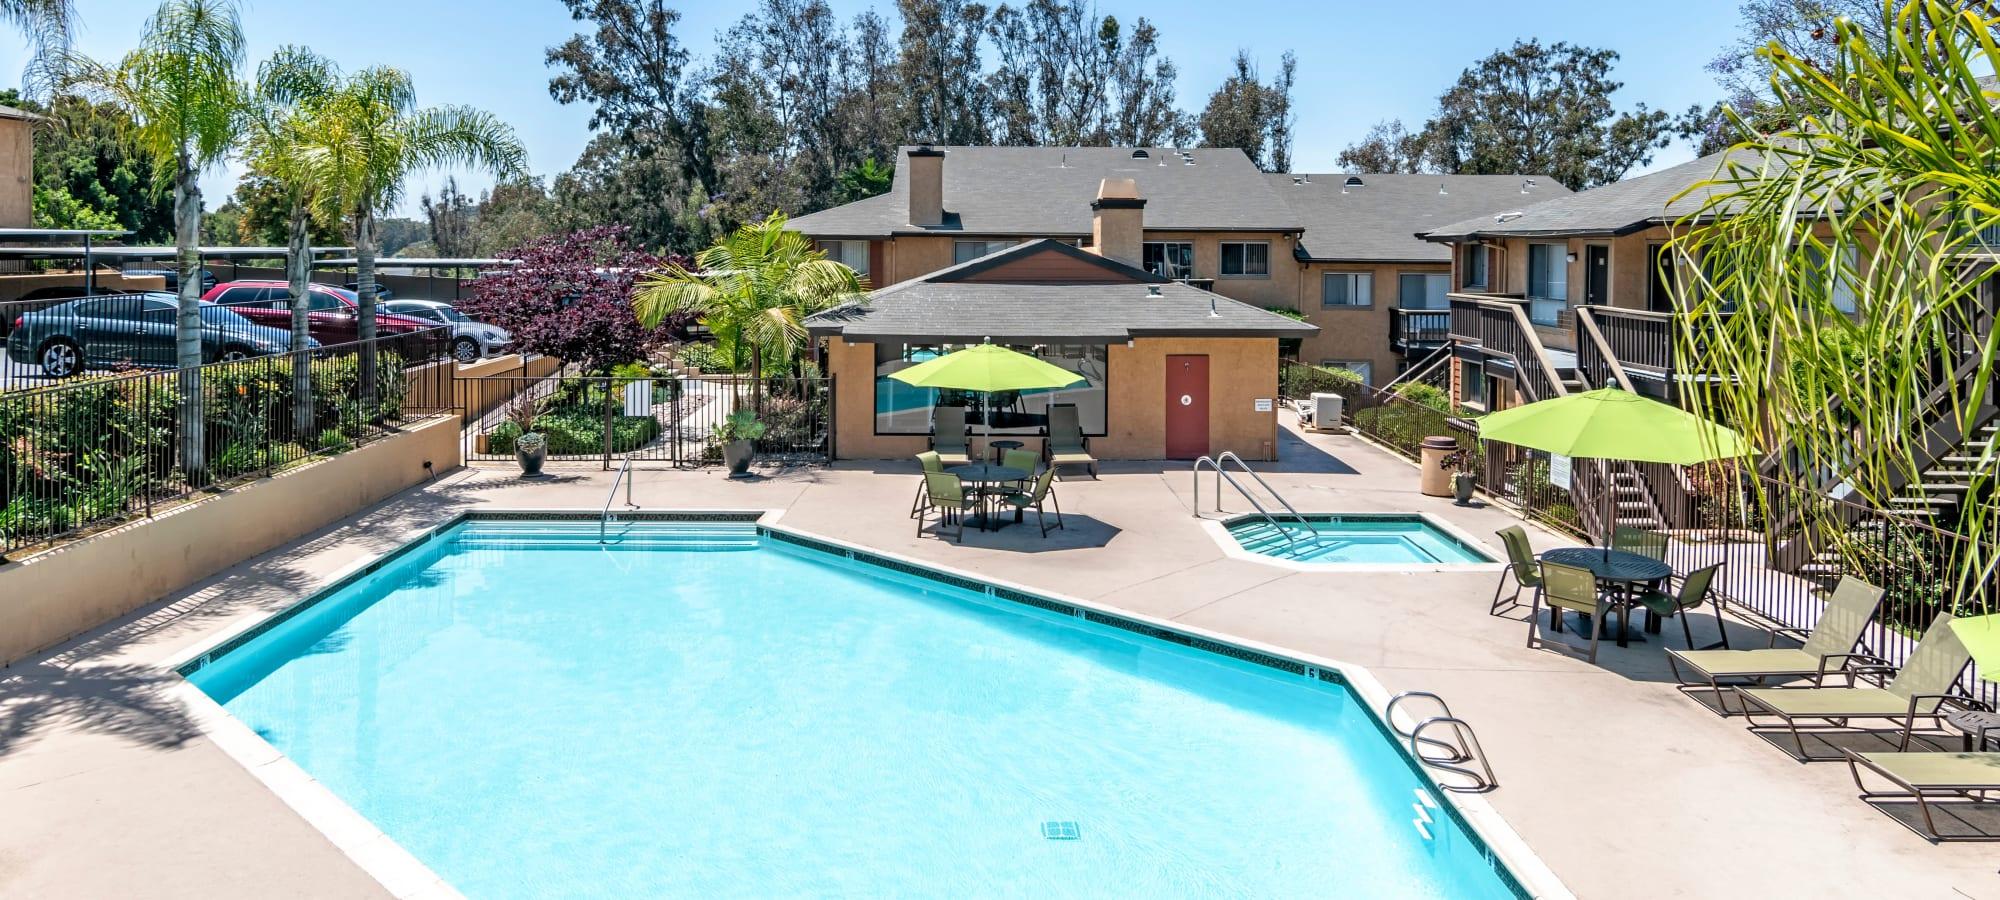 Lemon Grove, California apartments at Hillside Terrace Apartments